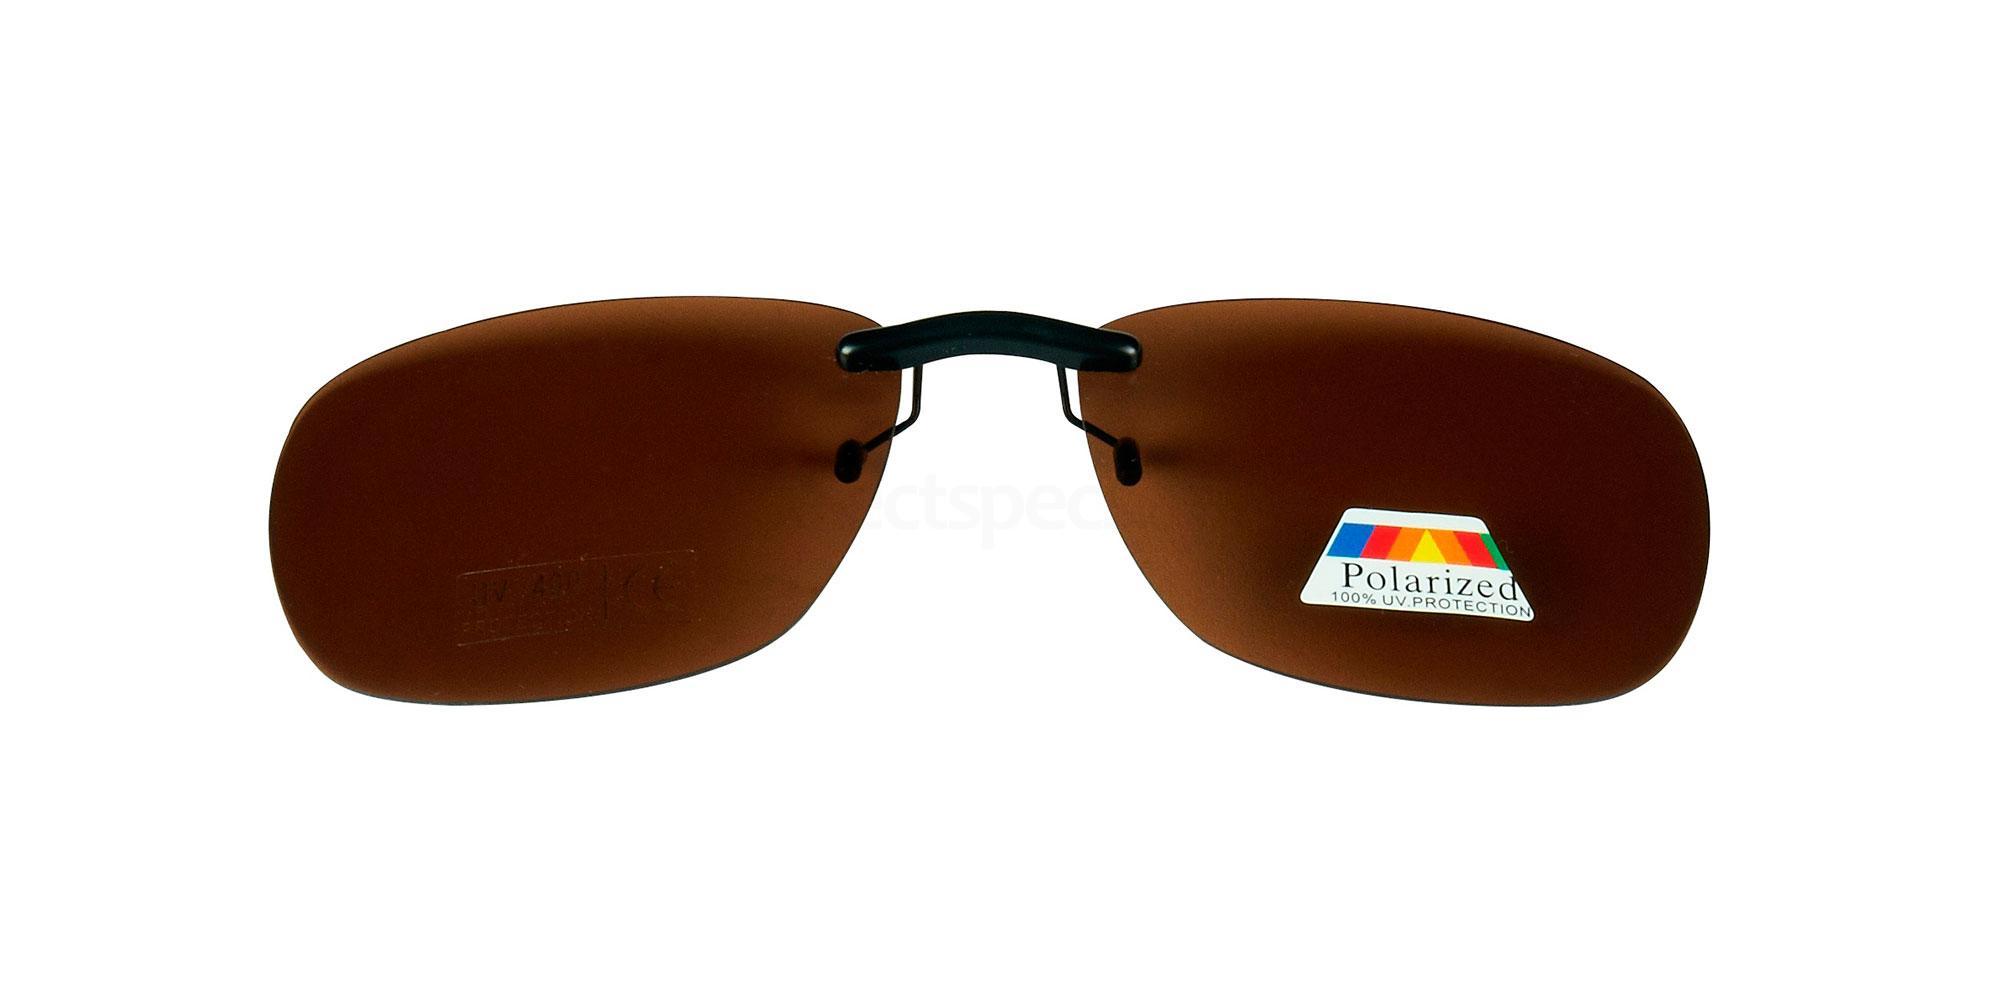 B CL5 – Sunglasses Clip-on Accessories, Optical accessories